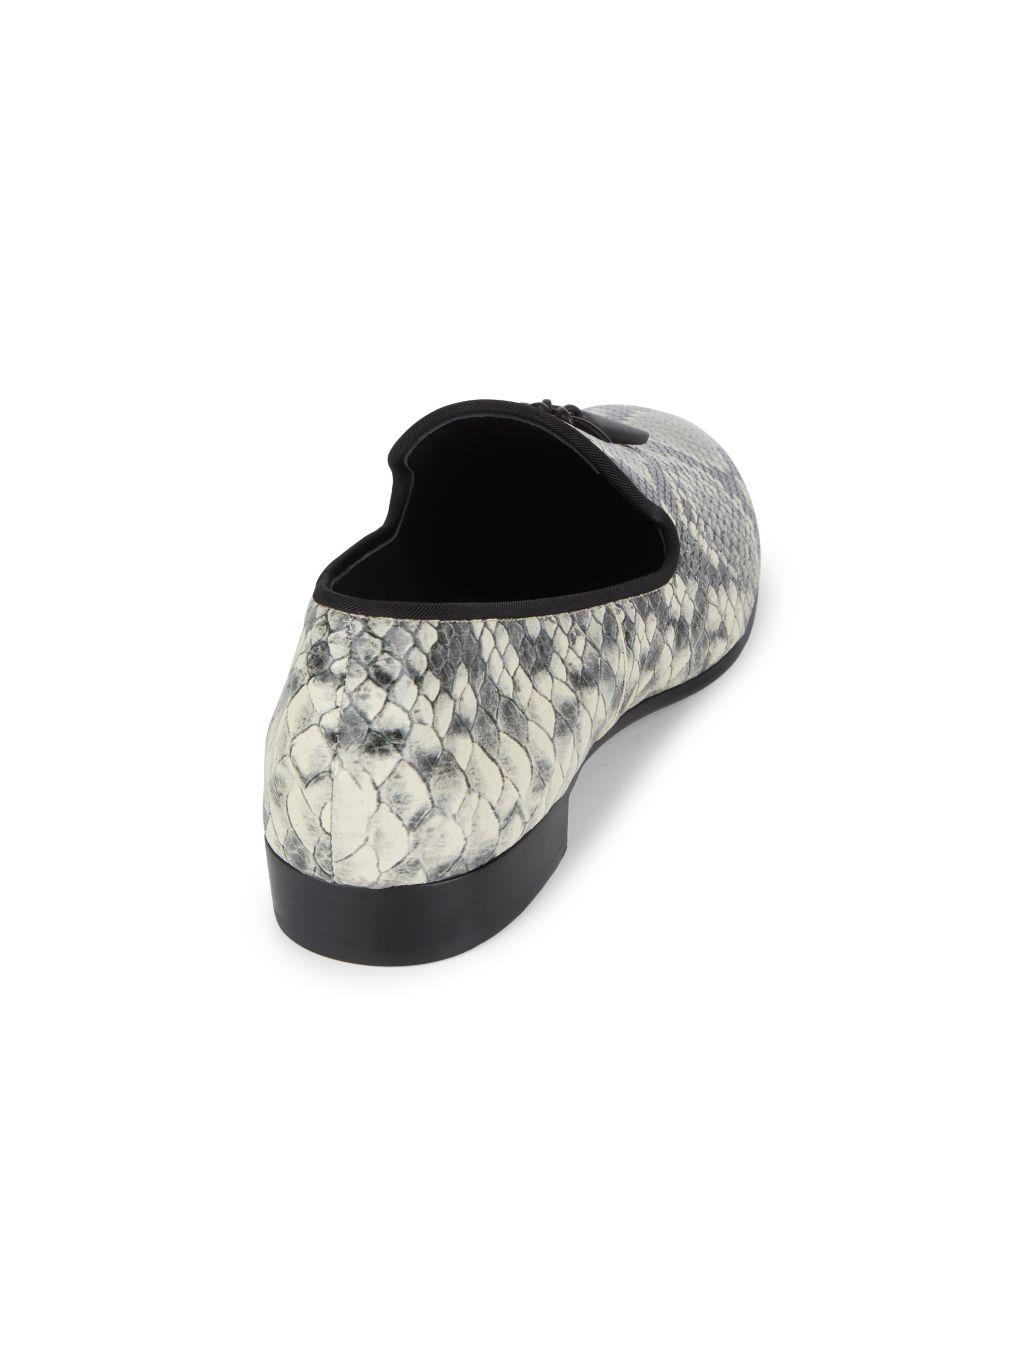 Giuseppe Zanotti Python-Print Embossed Leather Loafers